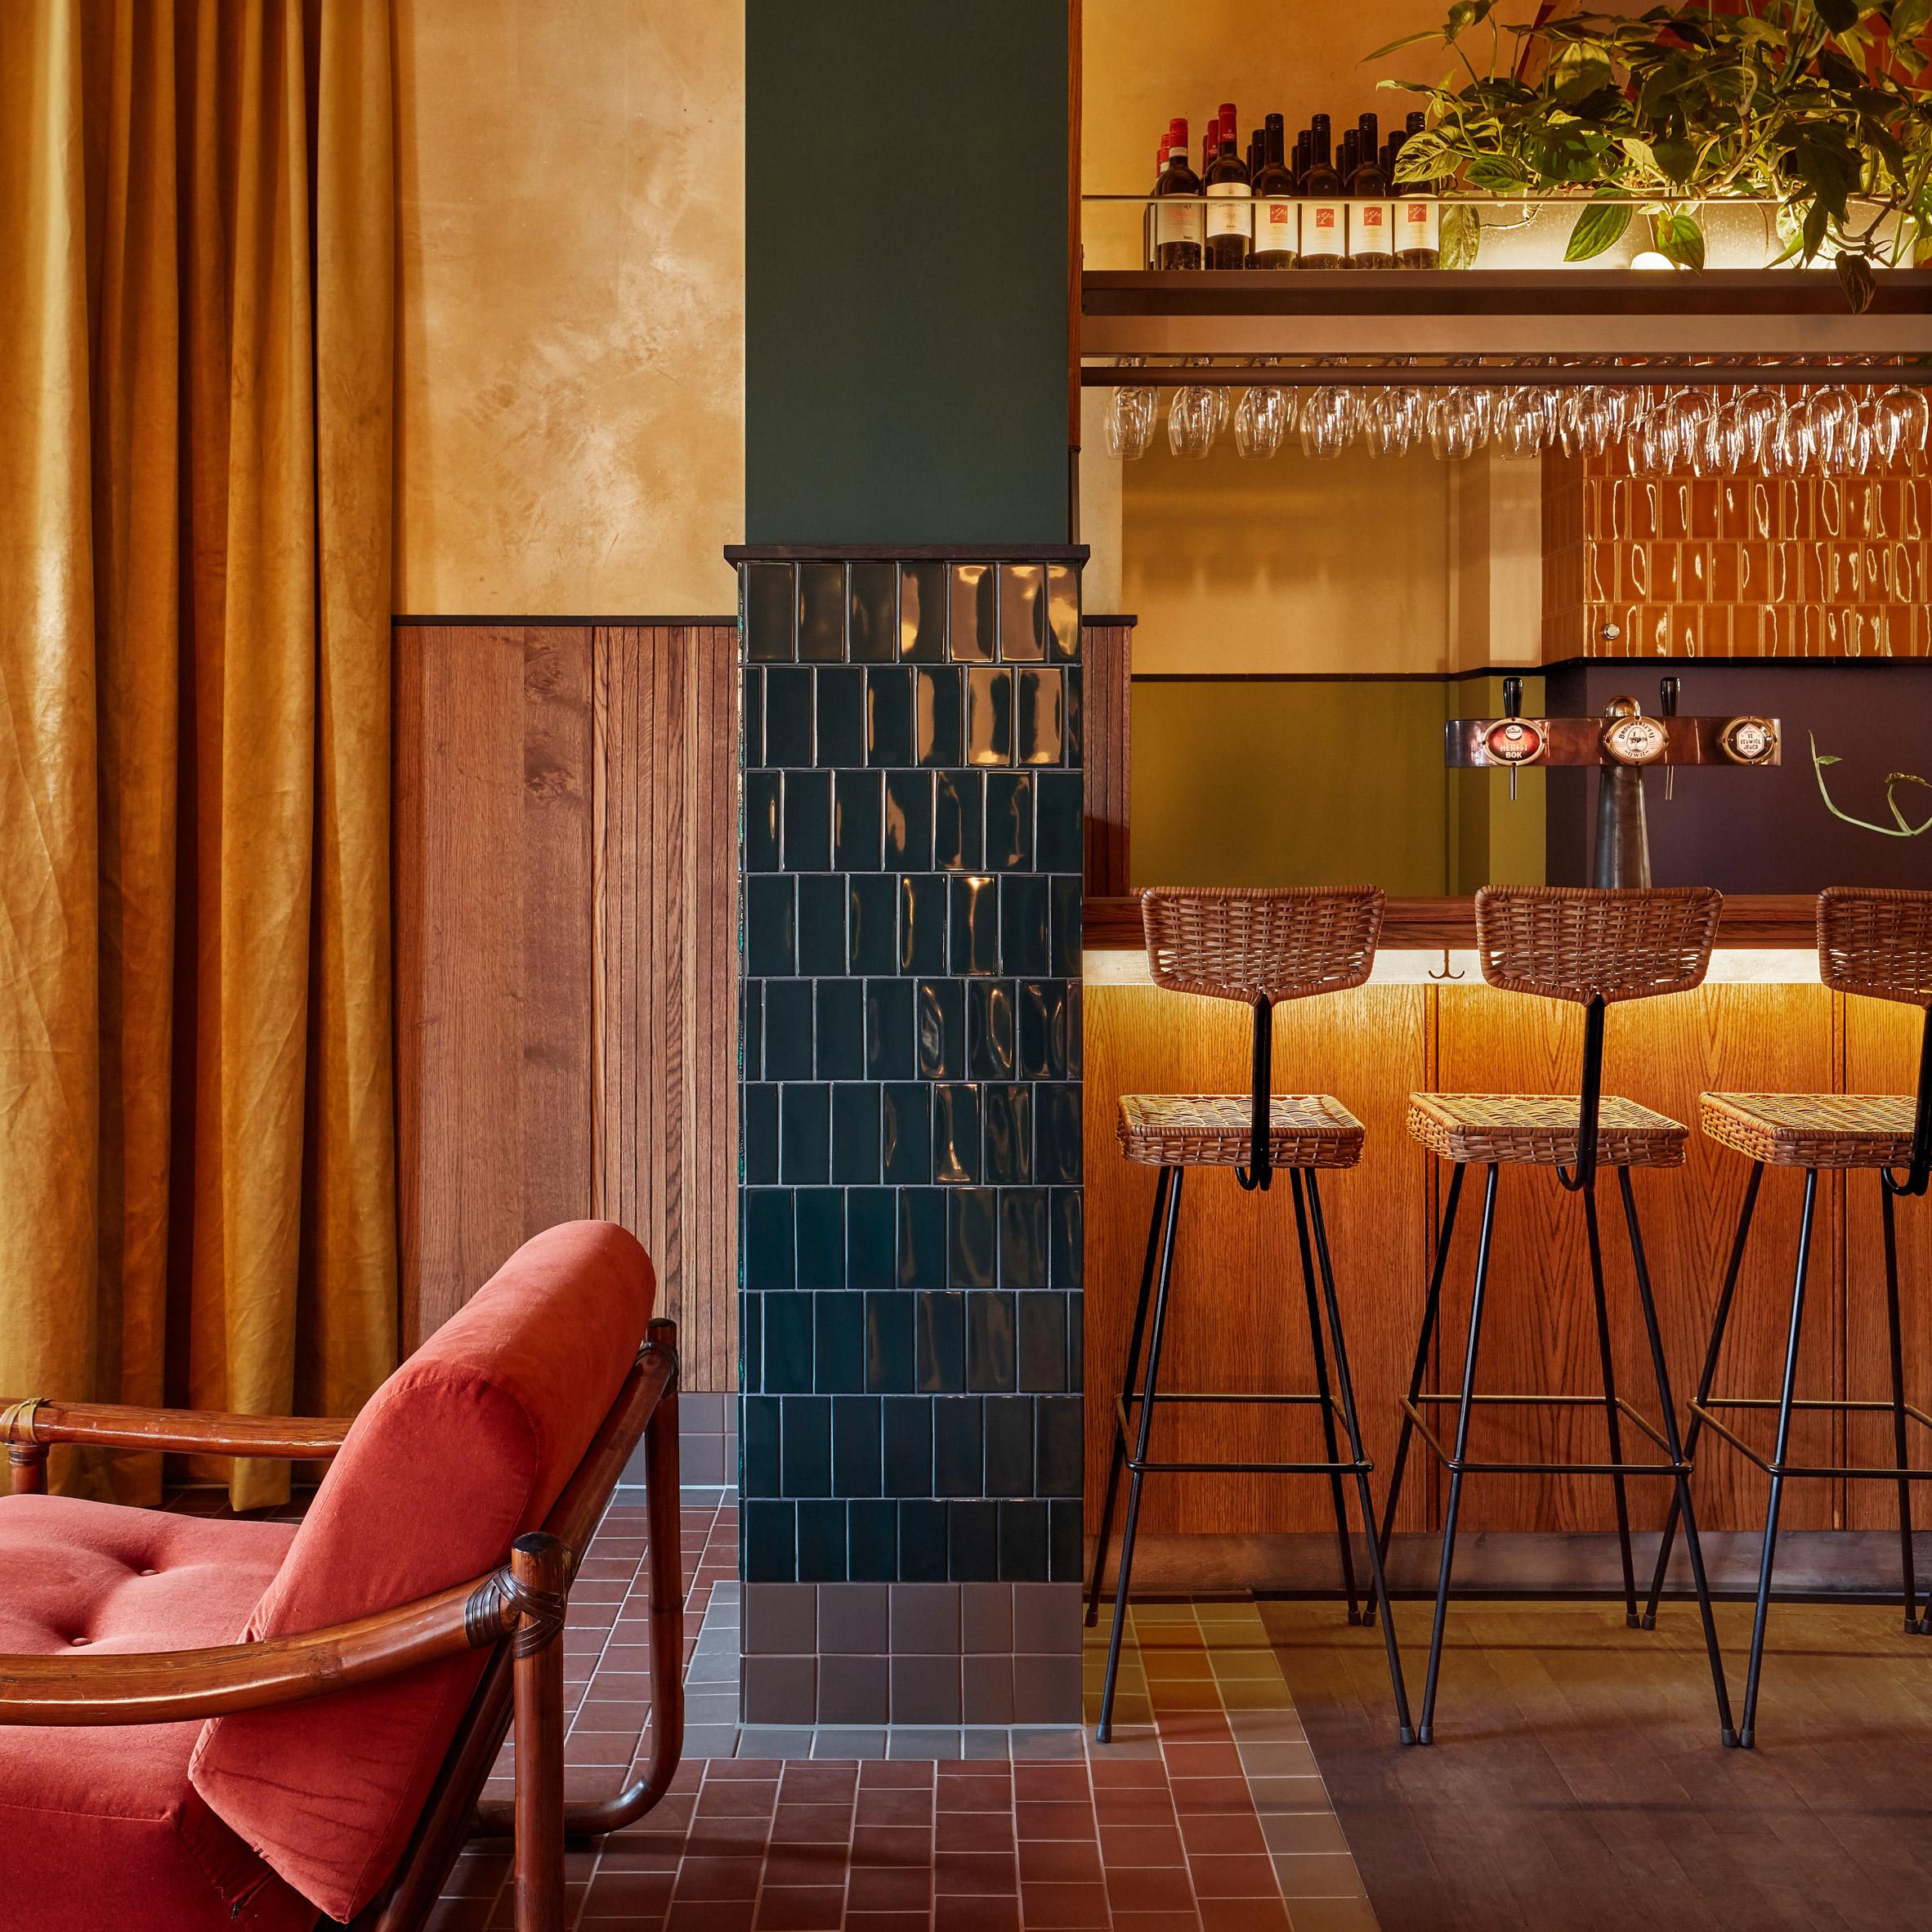 Interior Design Studio Amsterdam karavaan restaurant is designed as a series of natural